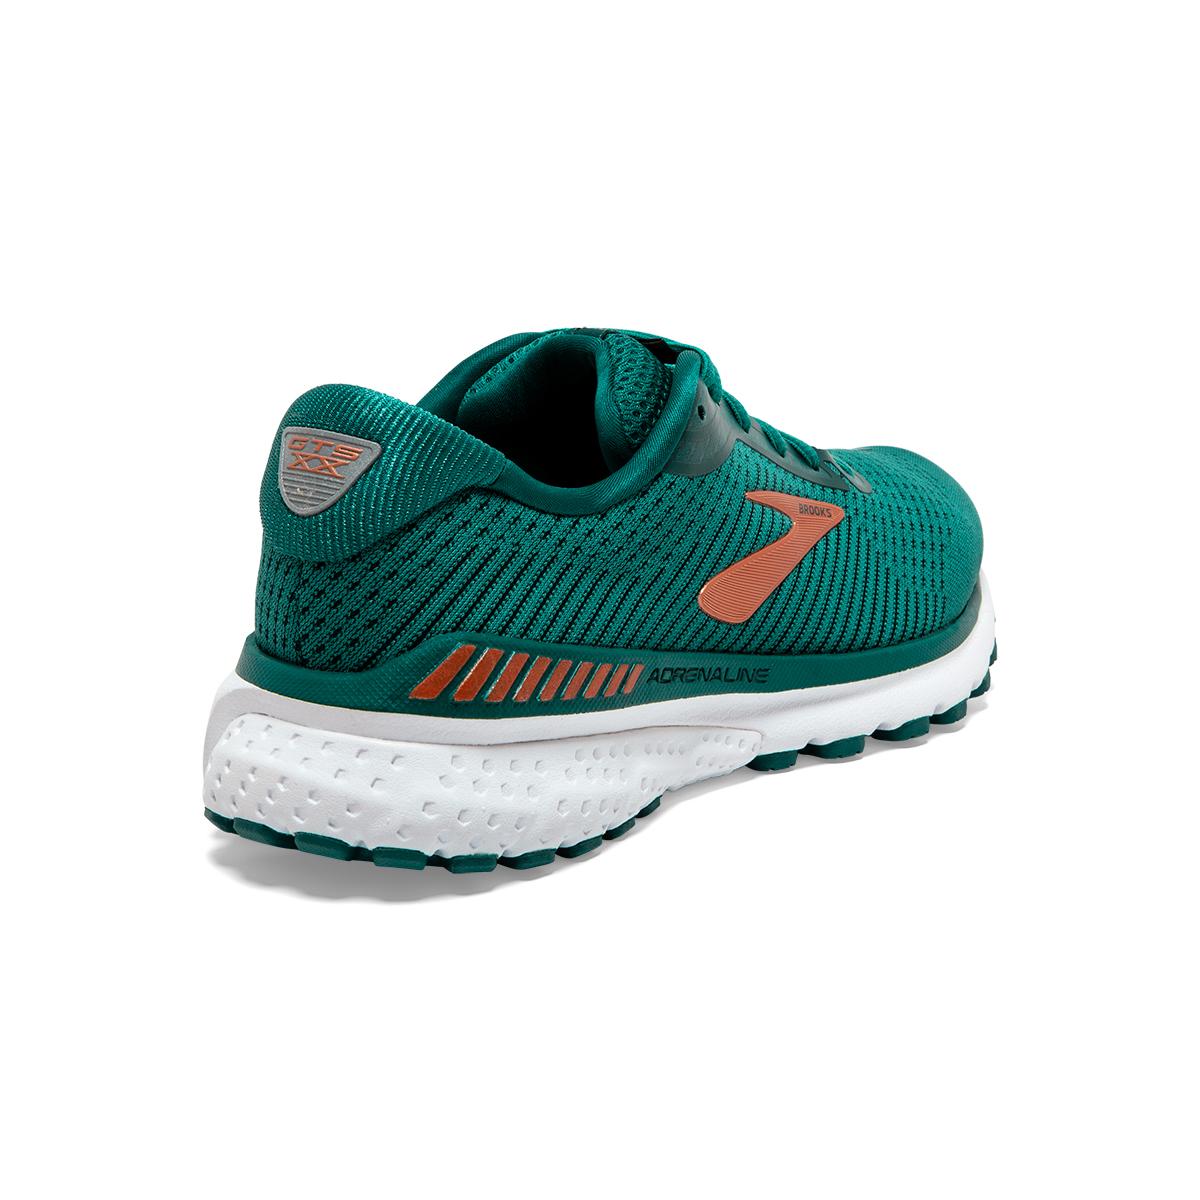 Women's Brooks Adrenaline GTS 20 Running Shoe - Color: Green/Teal/Copper - Size: 5 - Width: Regular, Green/Teal/Copper, large, image 4